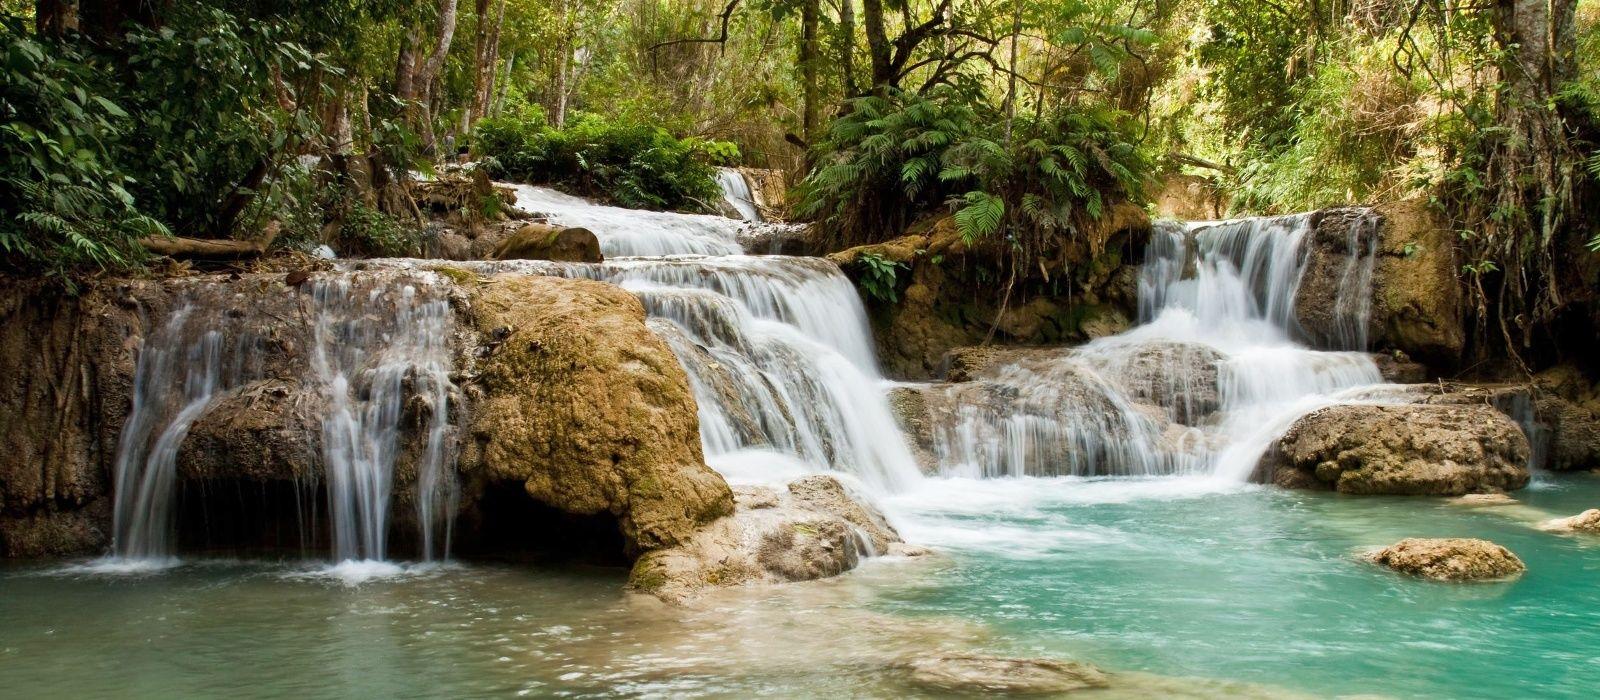 Undiscovered Laos Tour Trip 3